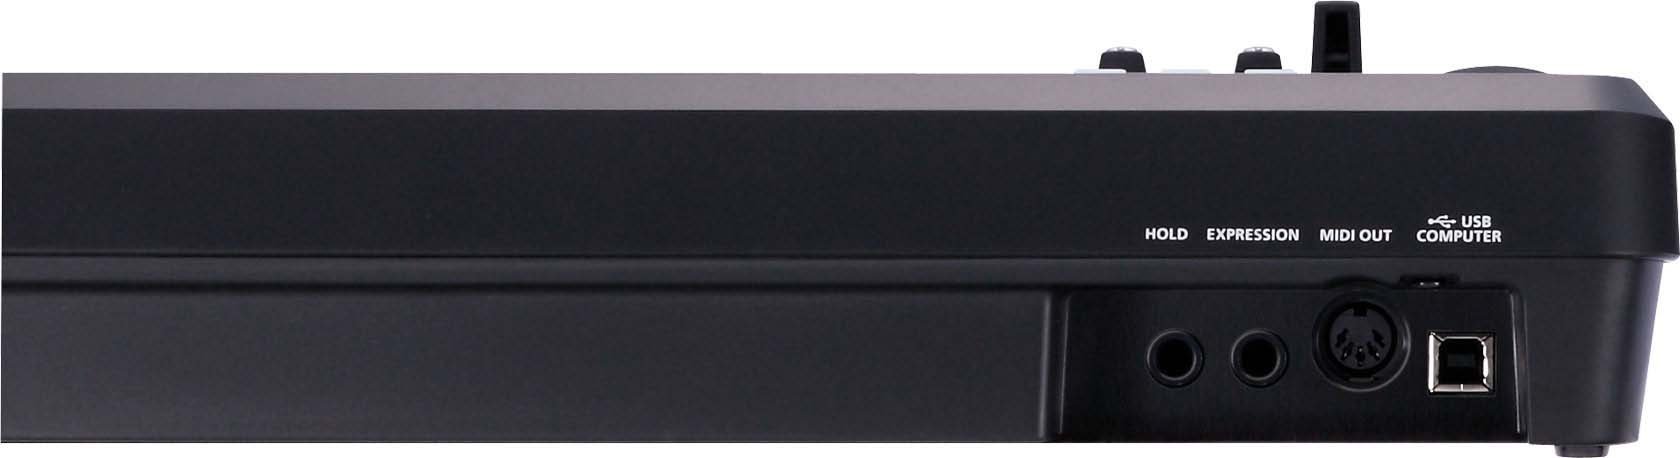 49-Key MIDI Keyboard in Black